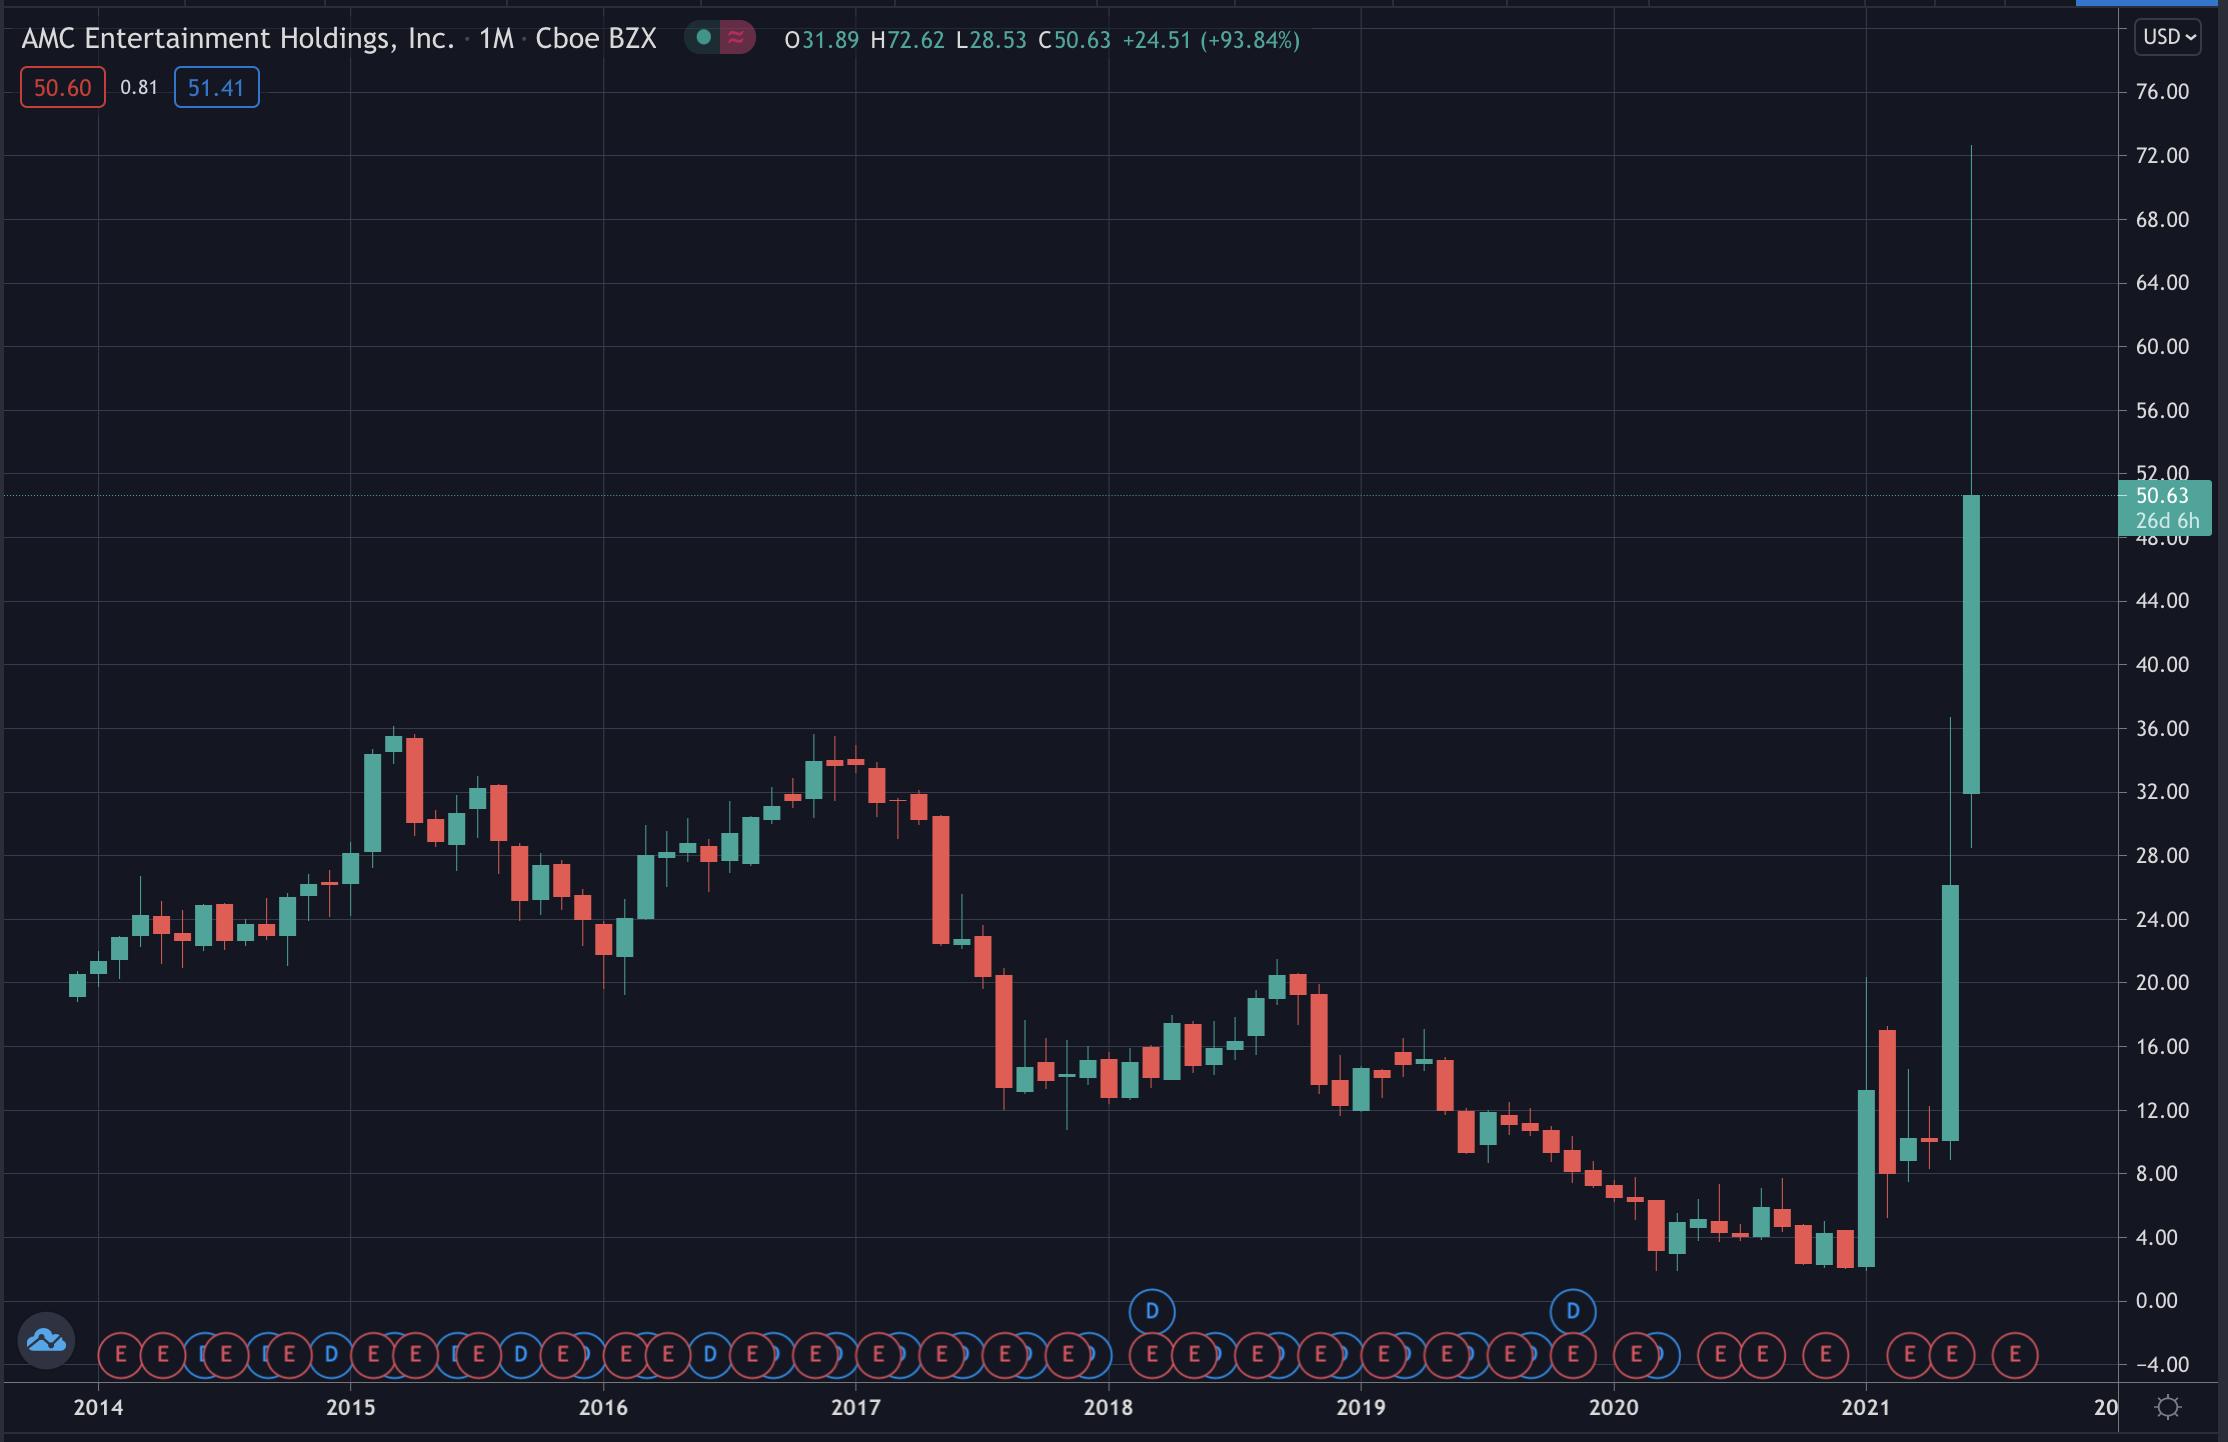 AMC's stock price, June 2021